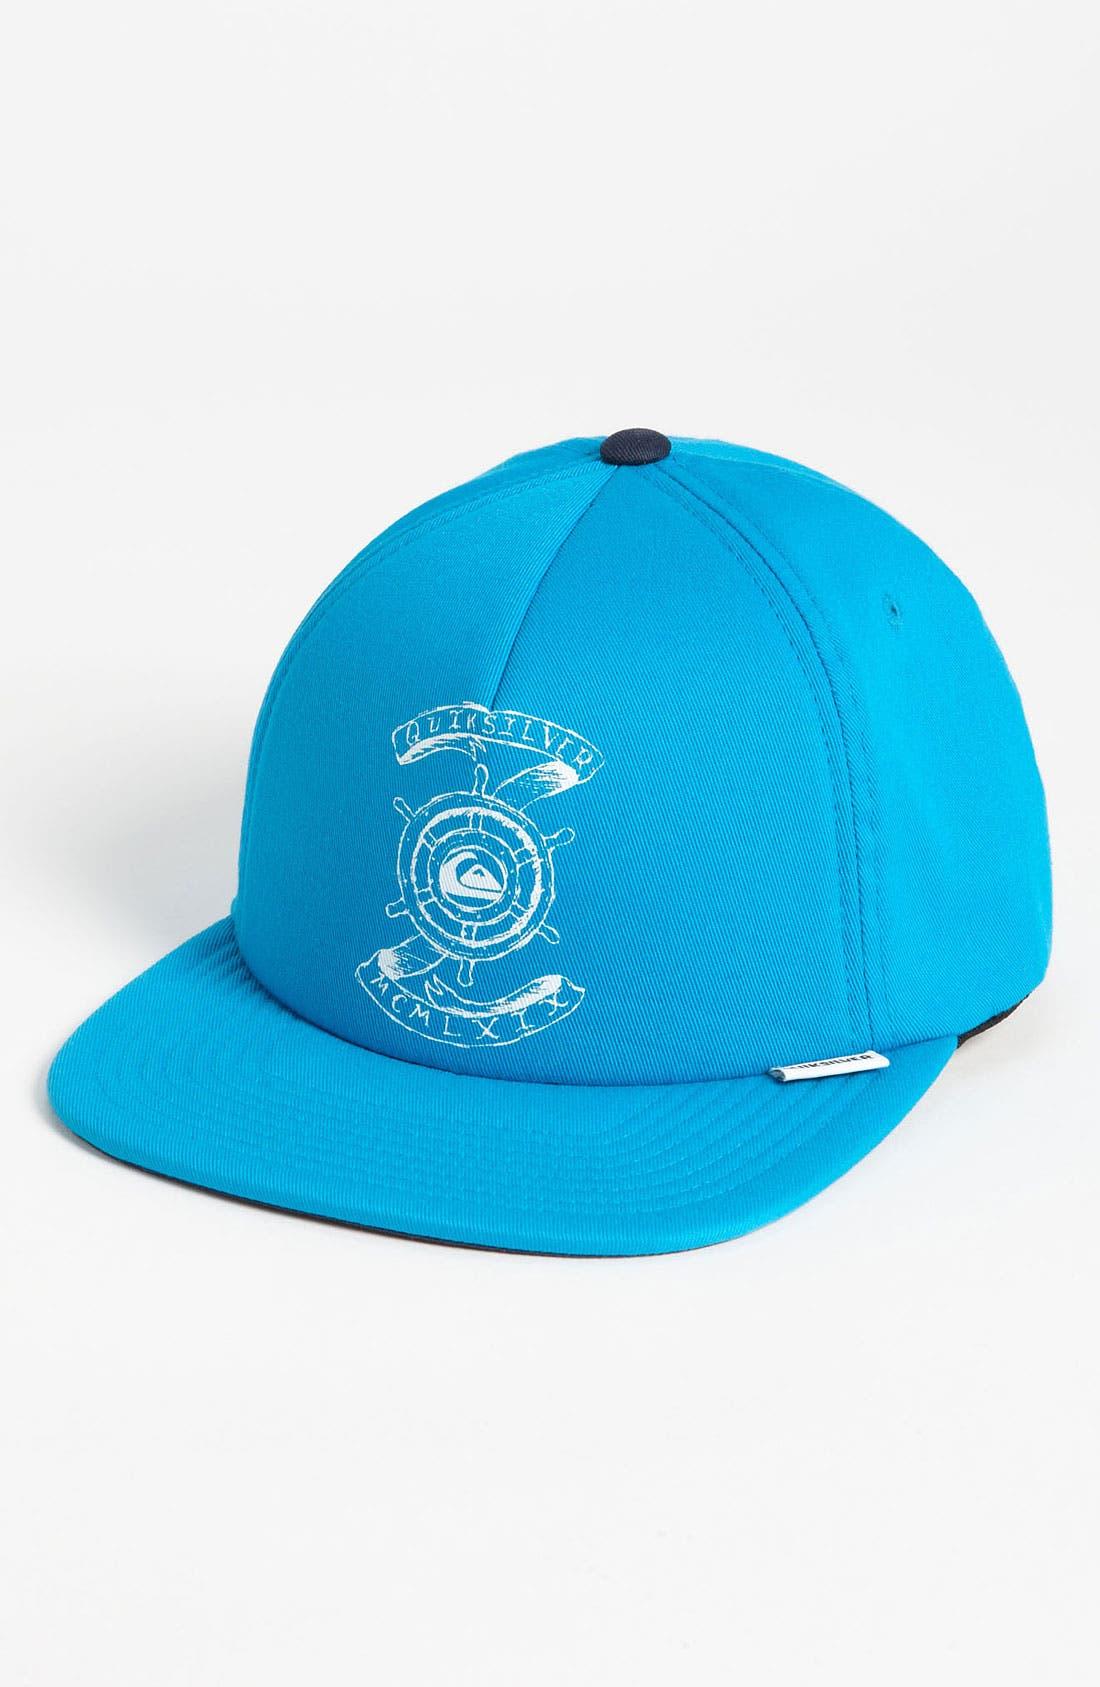 Alternate Image 1 Selected - Quiksilver 'Nixed' Baseball Cap (Boys)